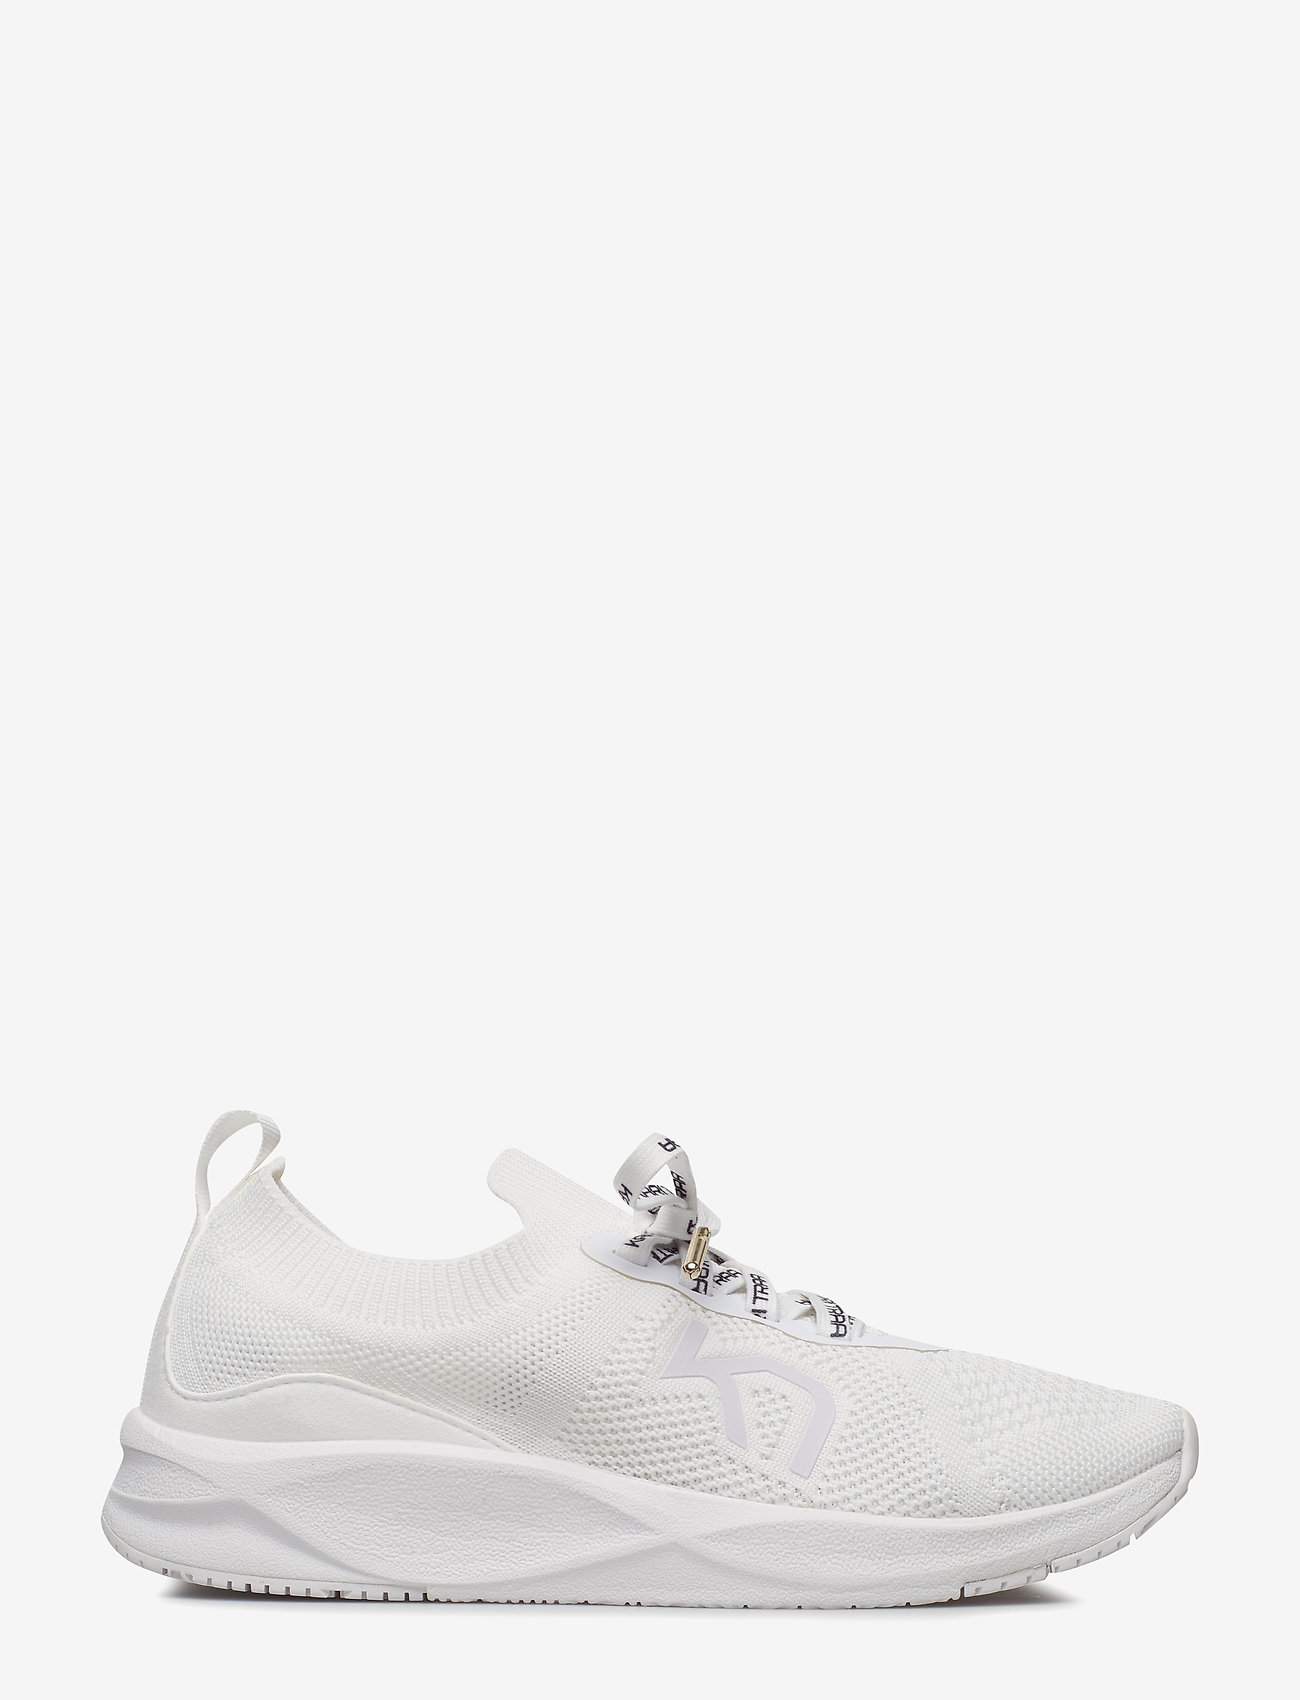 Kari Traa - BYKS - low top sneakers - white - 1